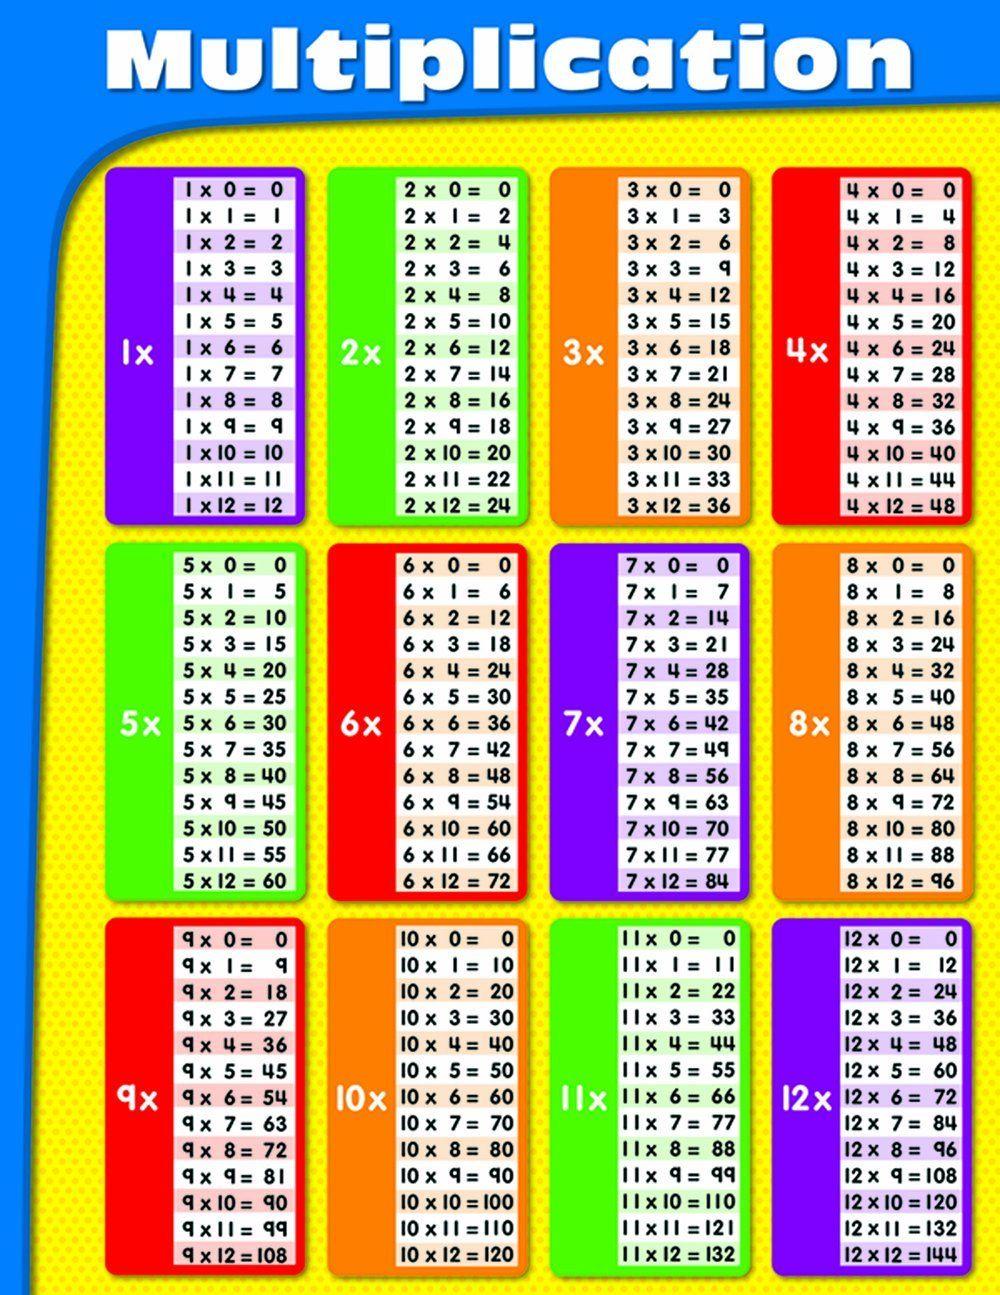 Carson dellosa multiplication chart 114069 education carson dellosa multiplication chart 114069 nvjuhfo Image collections